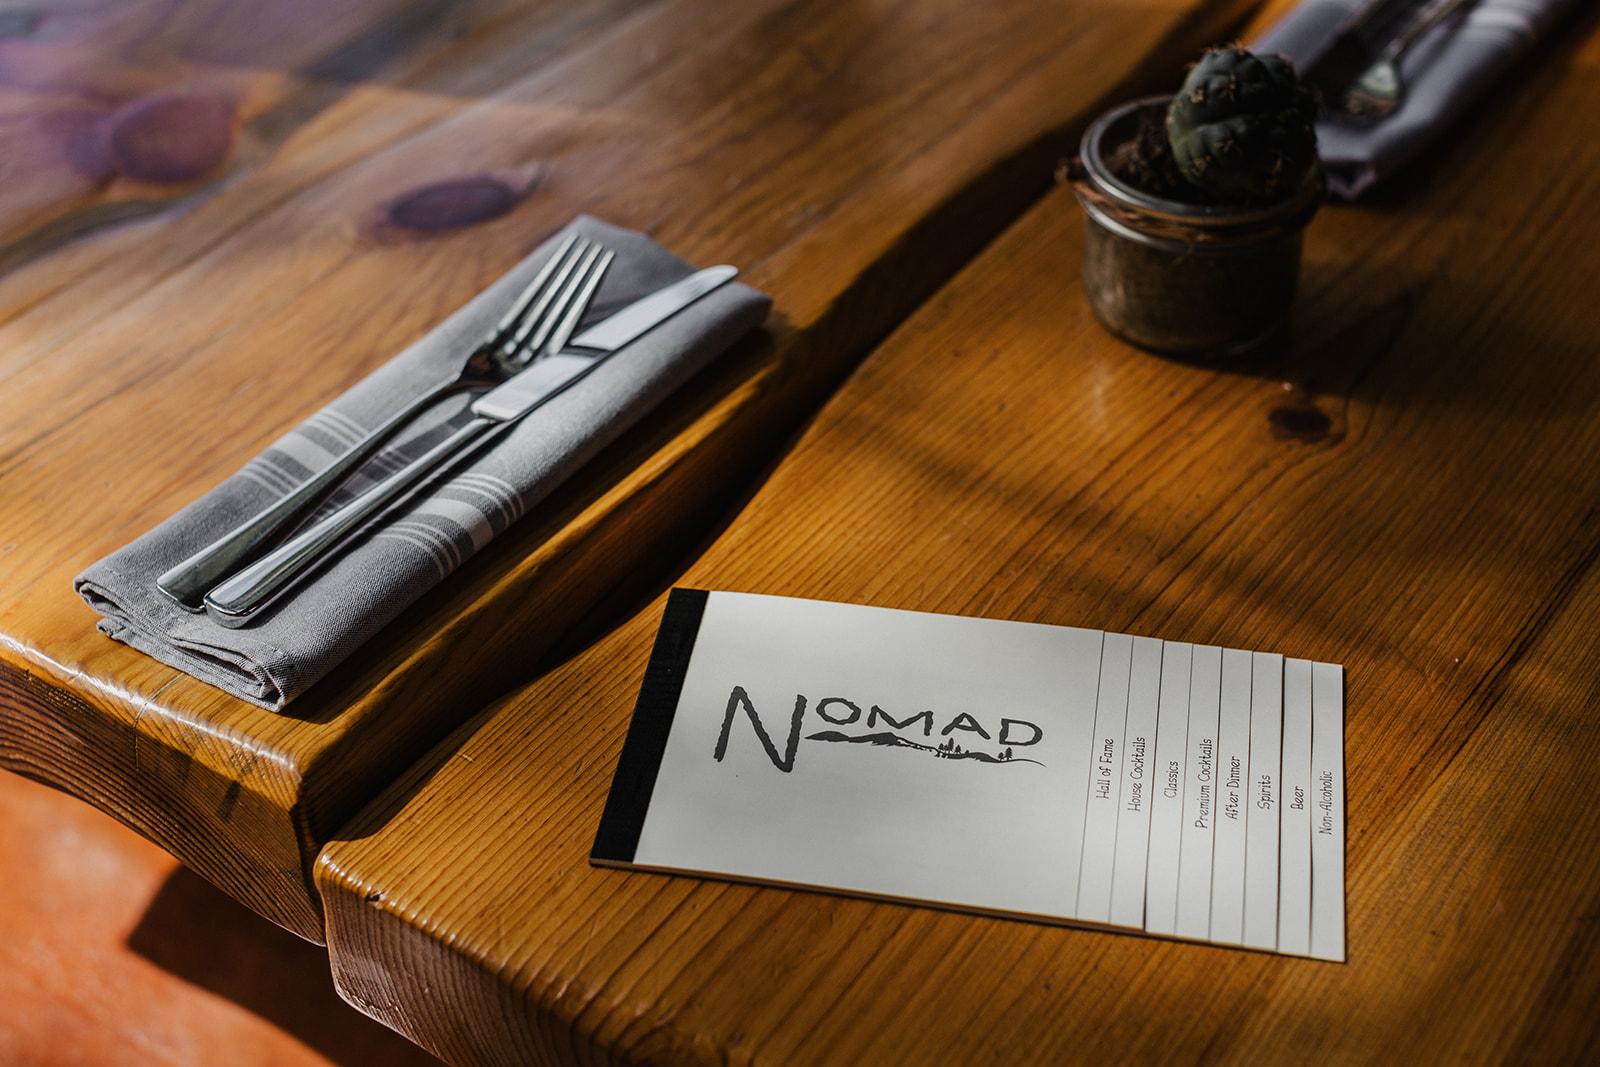 Nomad-2_websize.jpg